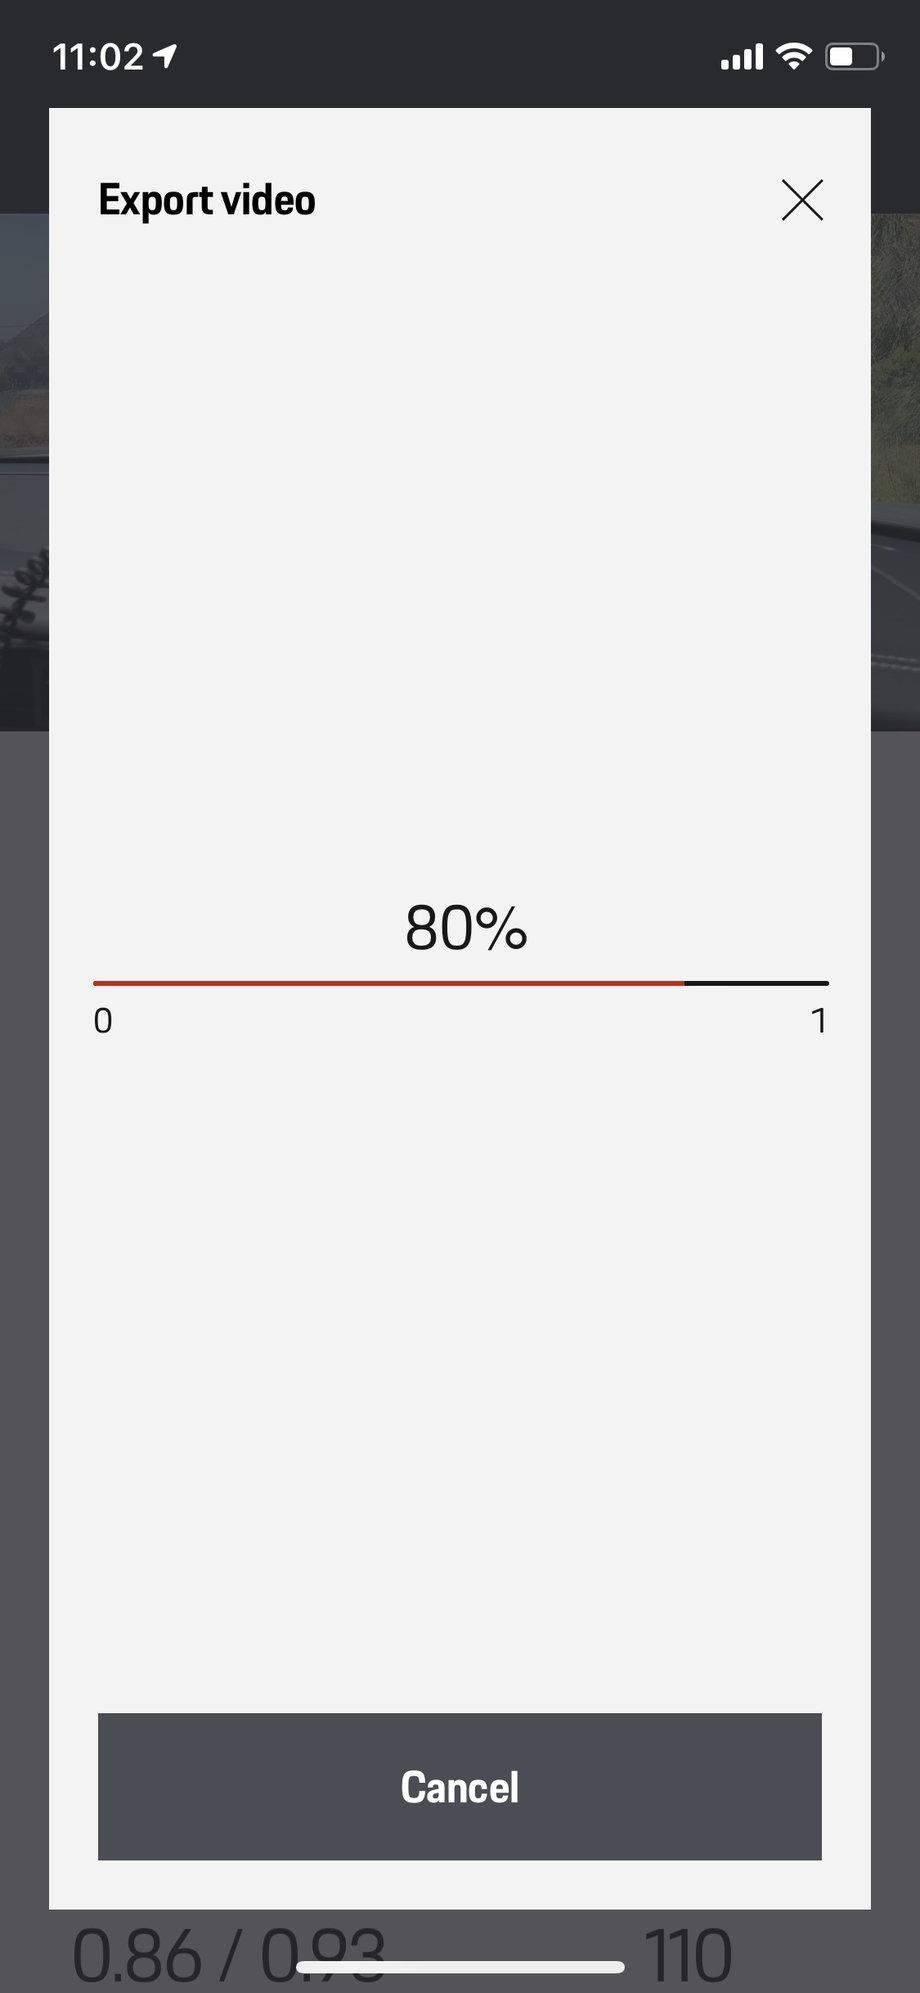 Track precision app - Rennlist - Porsche Discussion Forums